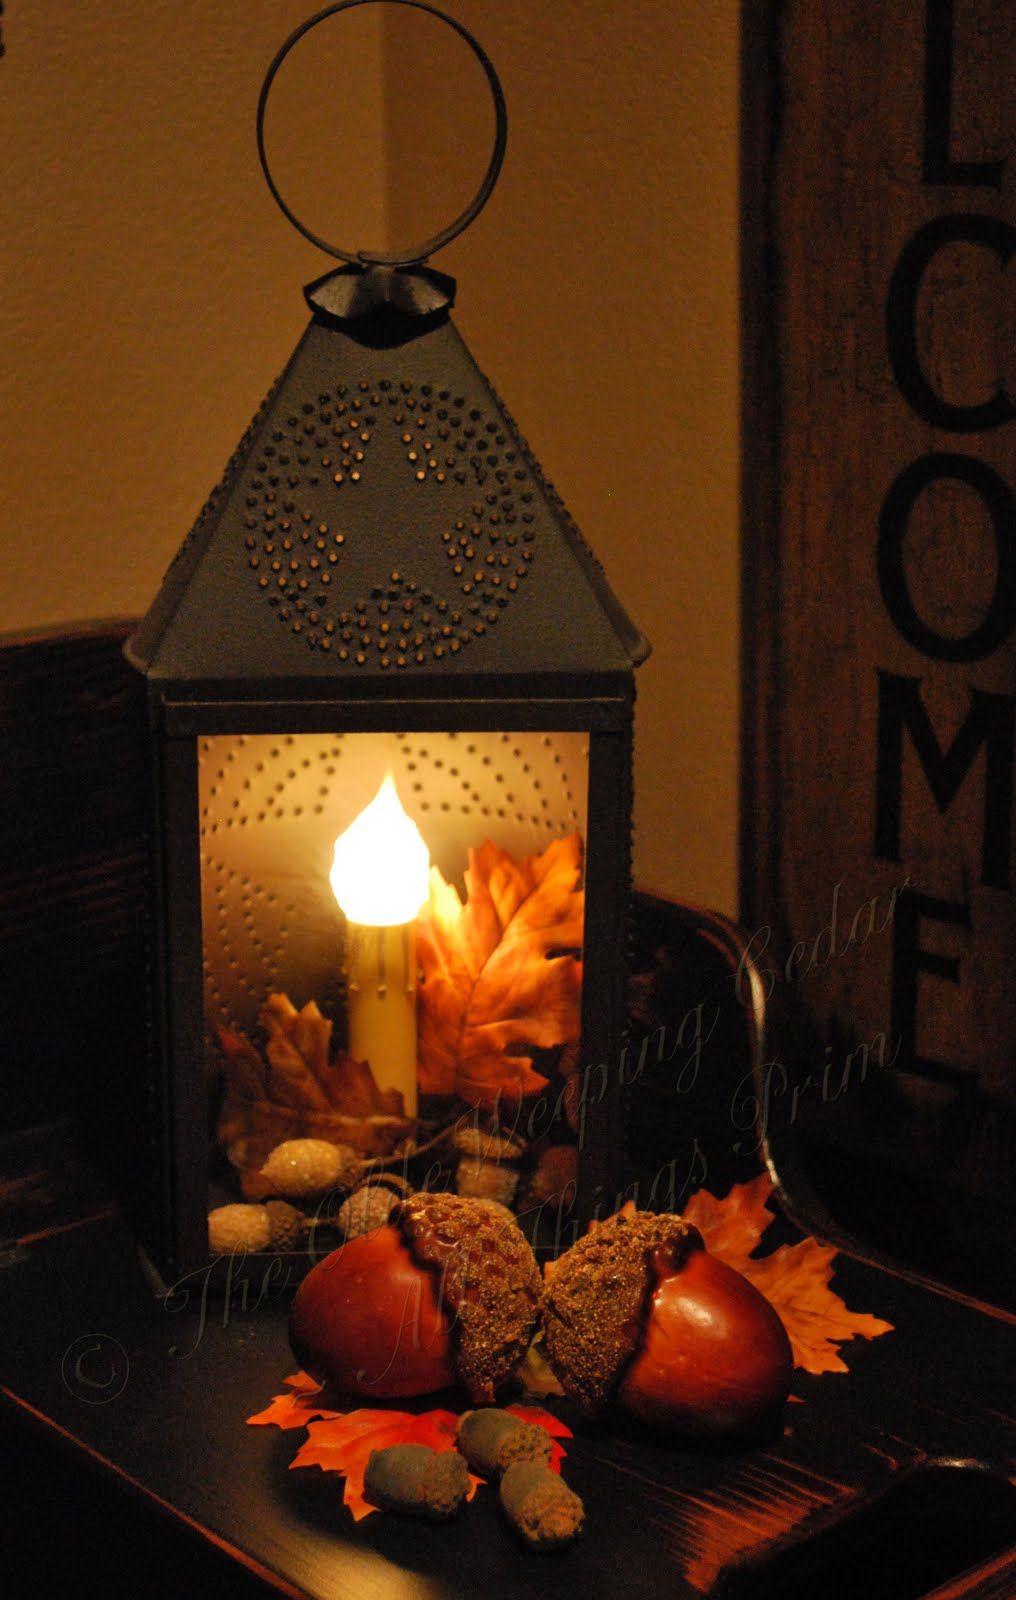 The olde weeping cedar welcoming autumn fall